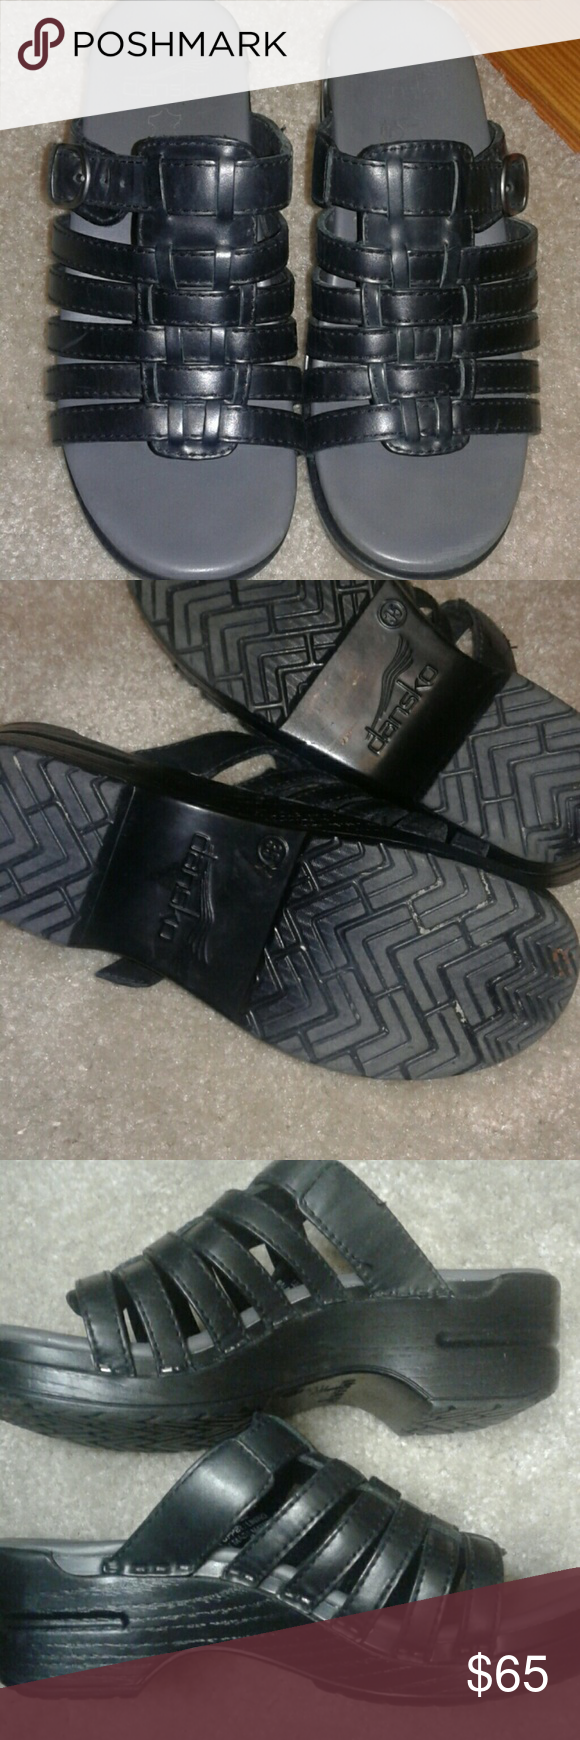 NWOT Dansko sandles size 6. Perfect and shiney! Dansko Shoes Sandals